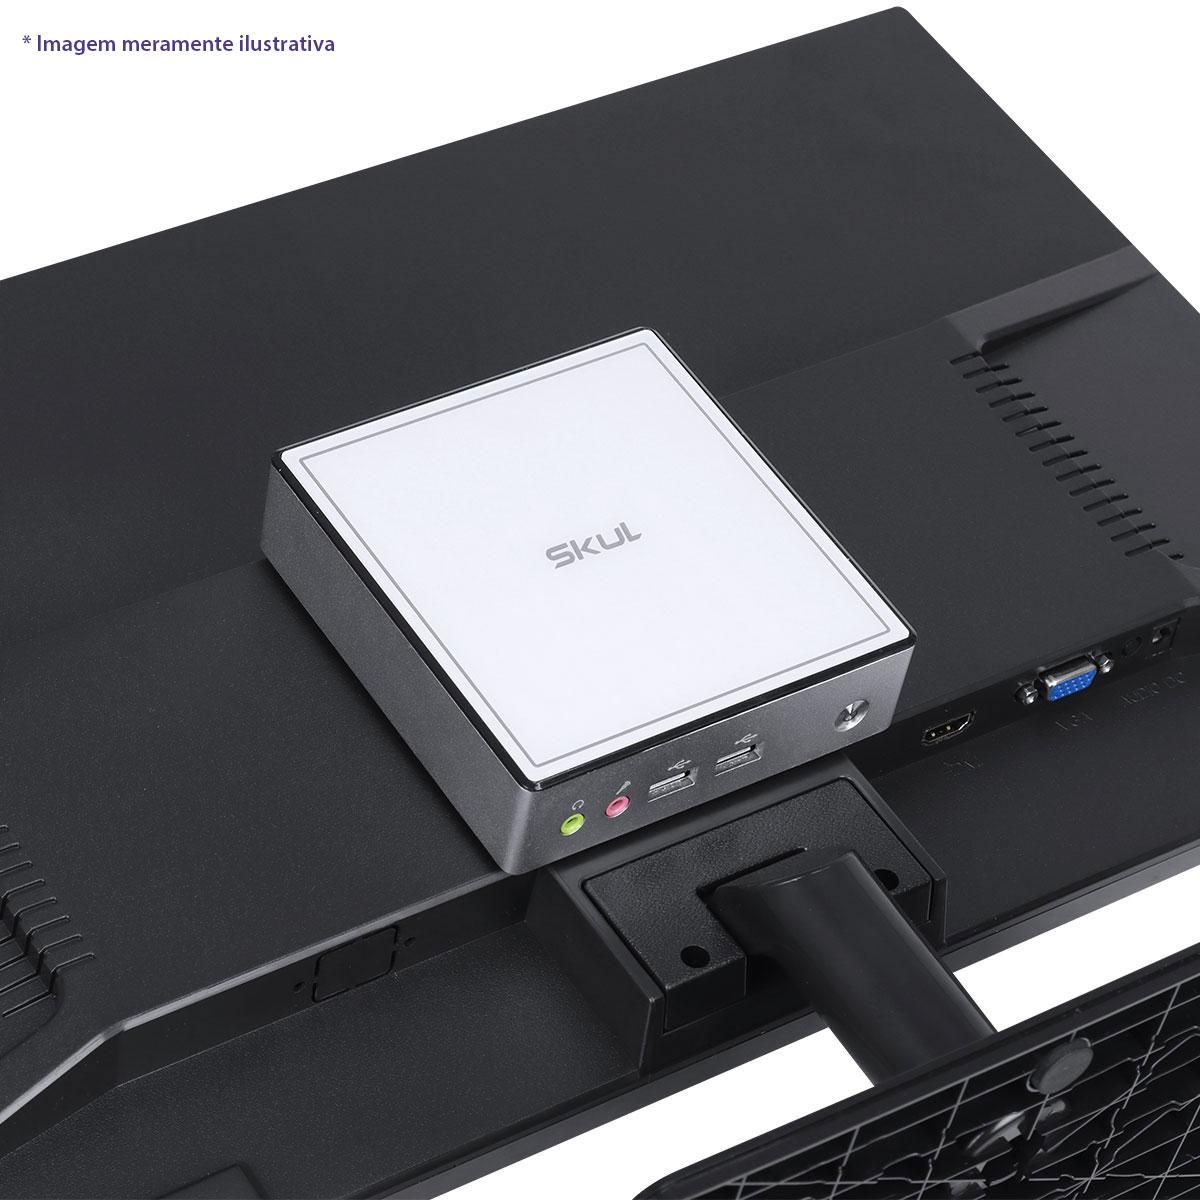 NANO COMPUTADOR BUSINESS B500 - I5 5300U 2.3GHZ MEM 8GB DDR3 SODIMM SSD 240GB WI-FI FONTE EXTERNA LINUX  - Audio Video & cia